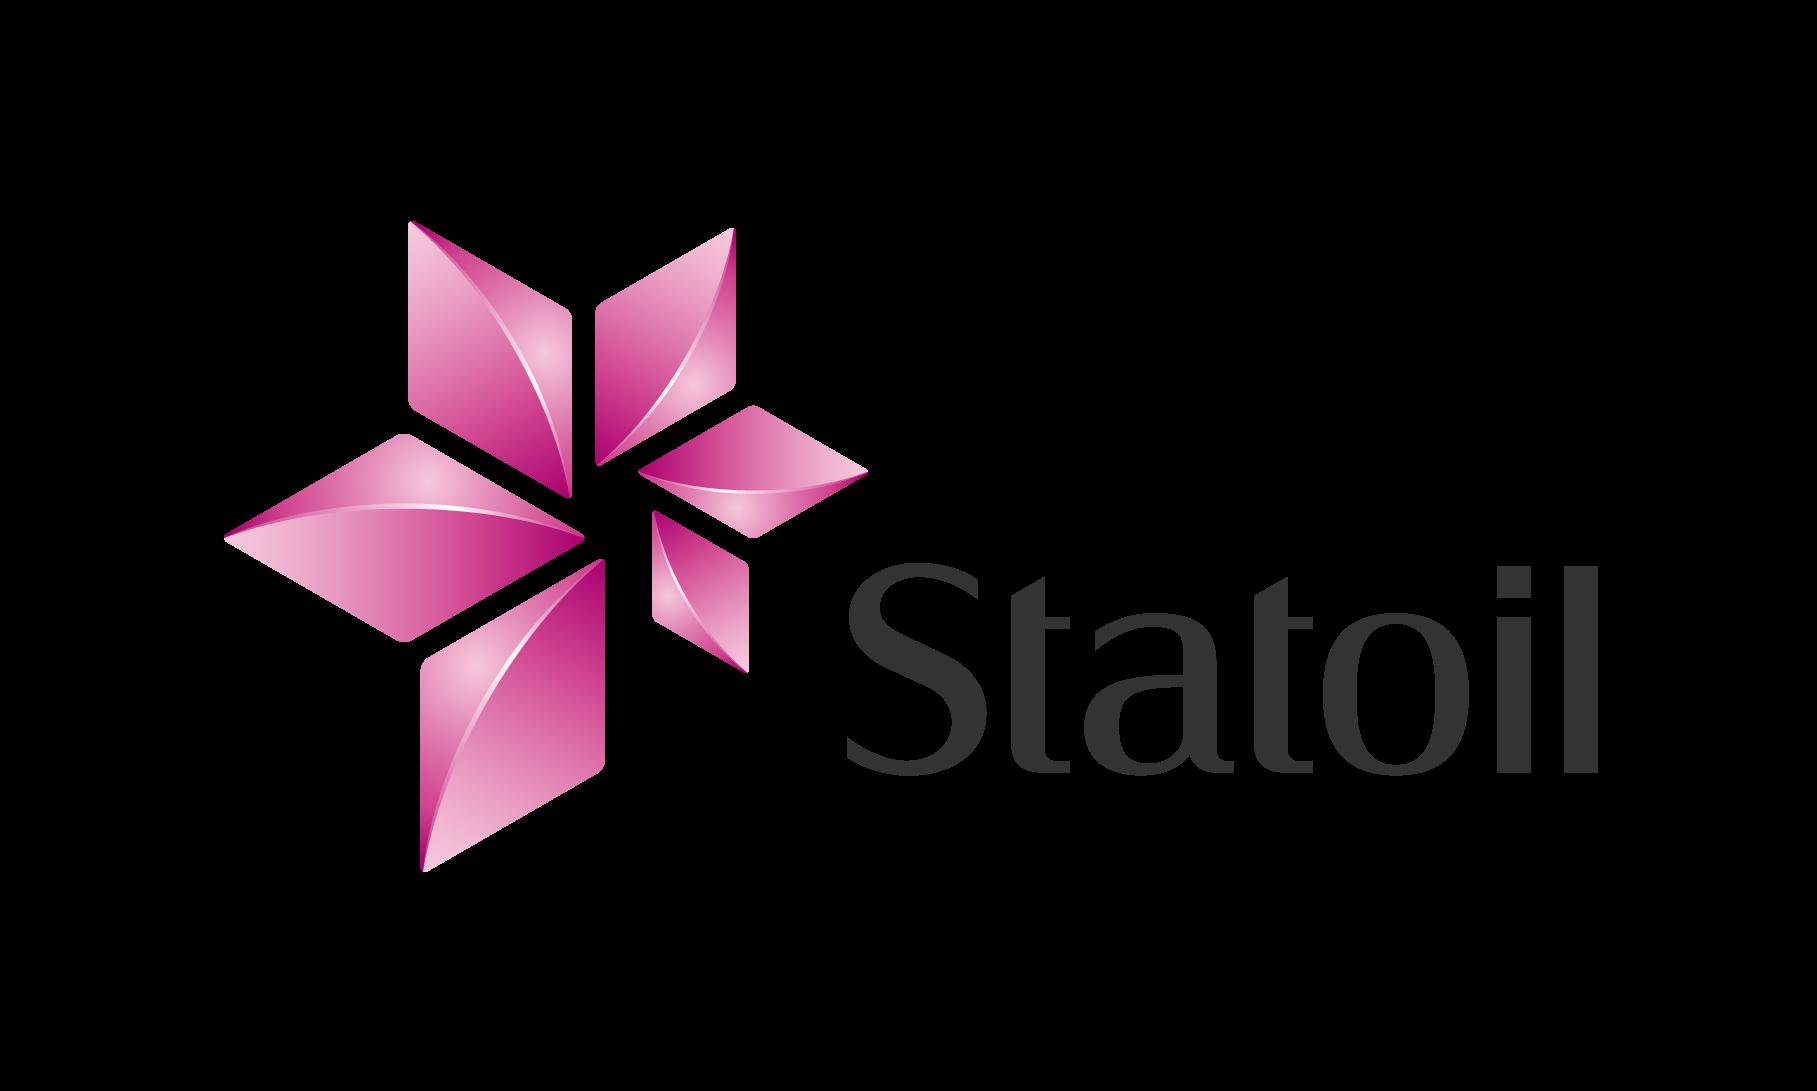 Statoil ASA logo